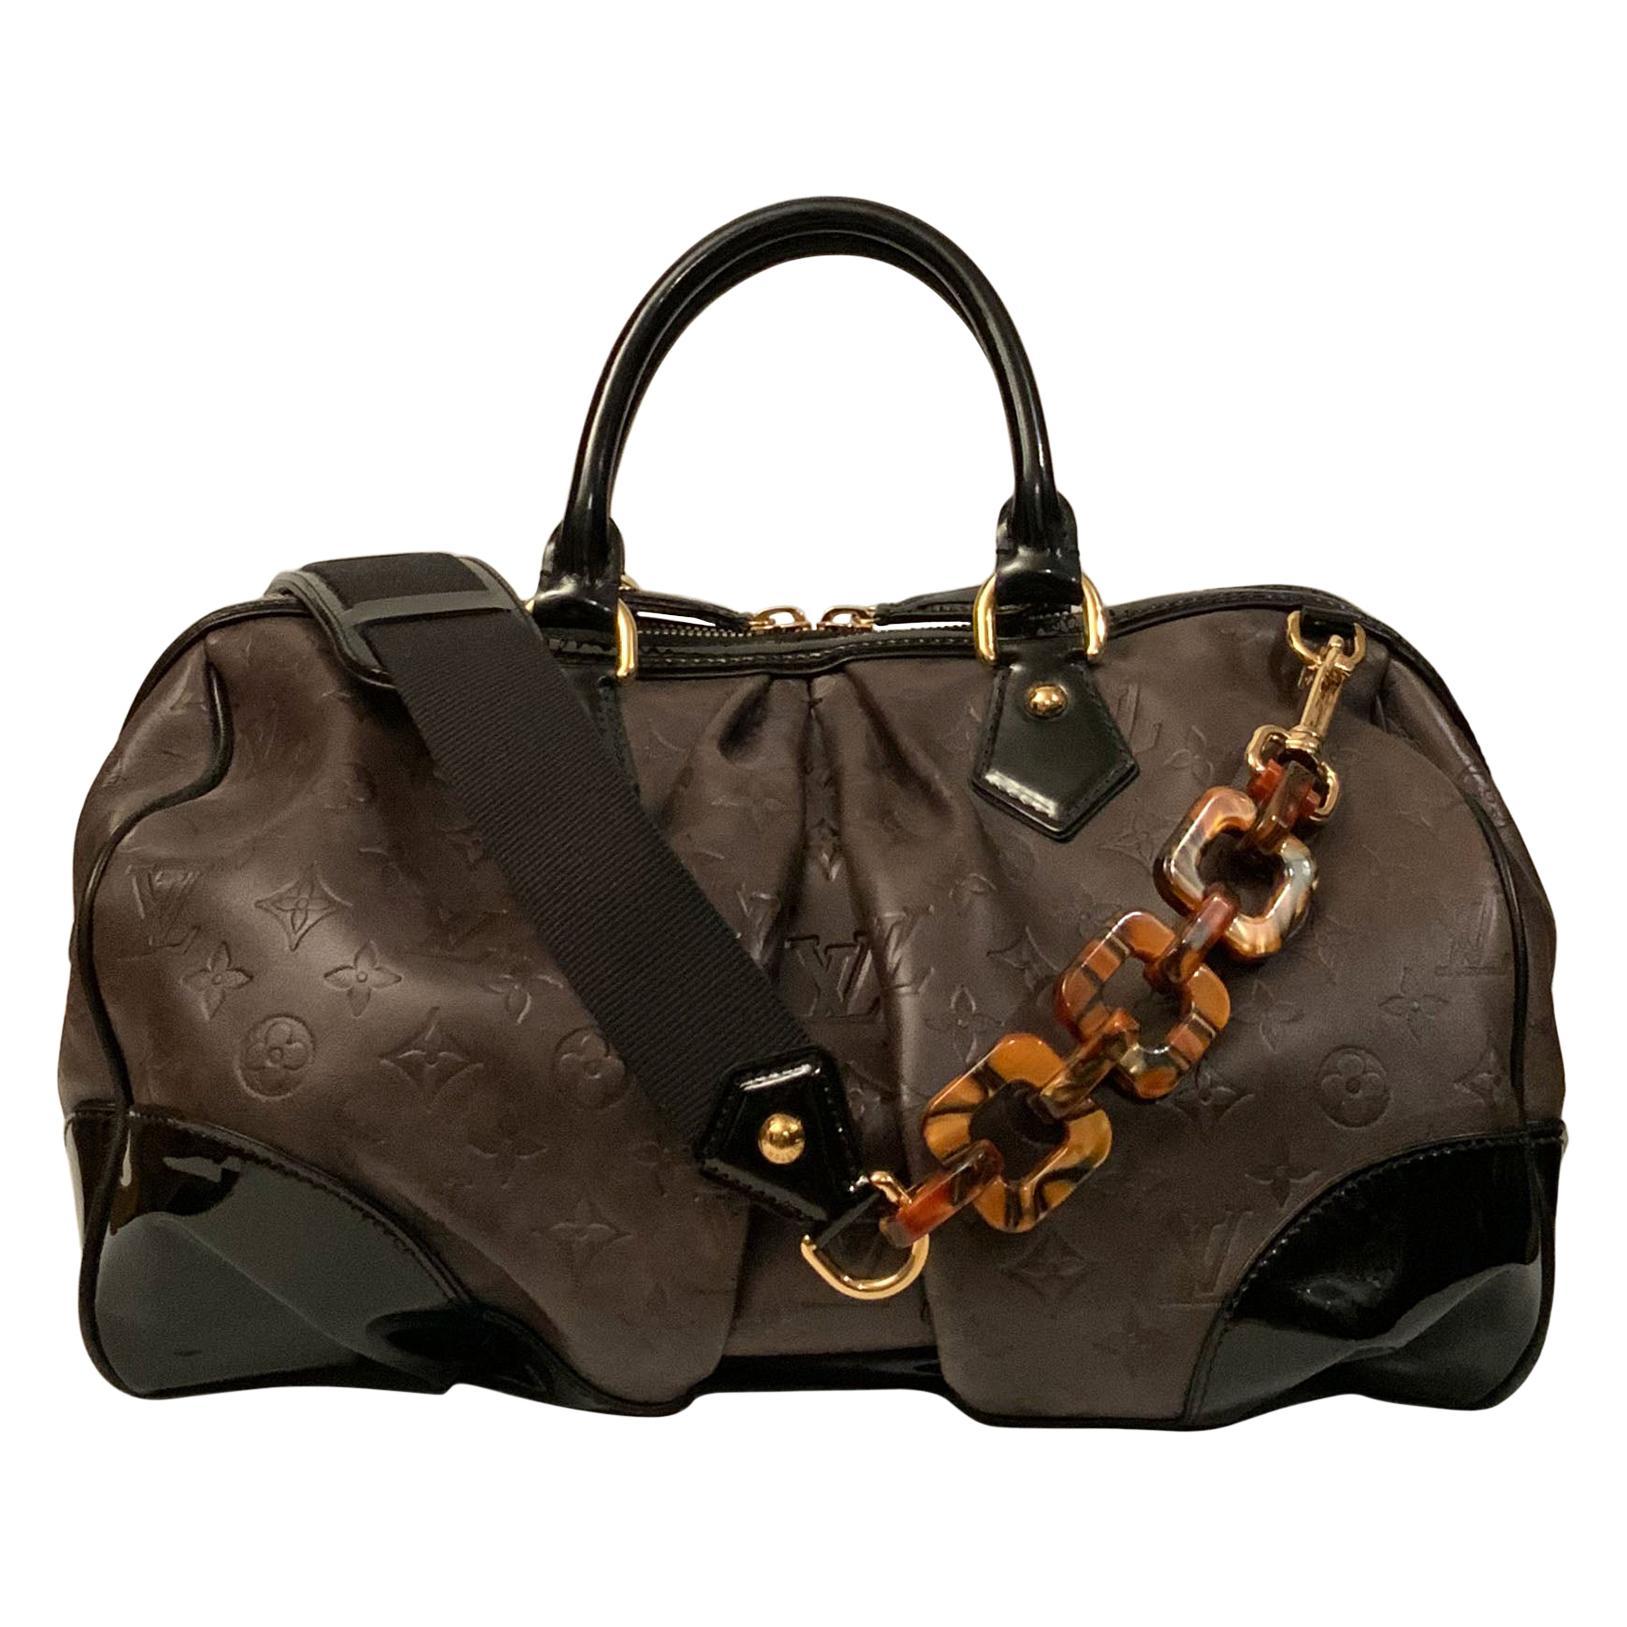 Louis Vuitton Limited Edition Brown Embossed Calfskin Monogram Stephen Bag